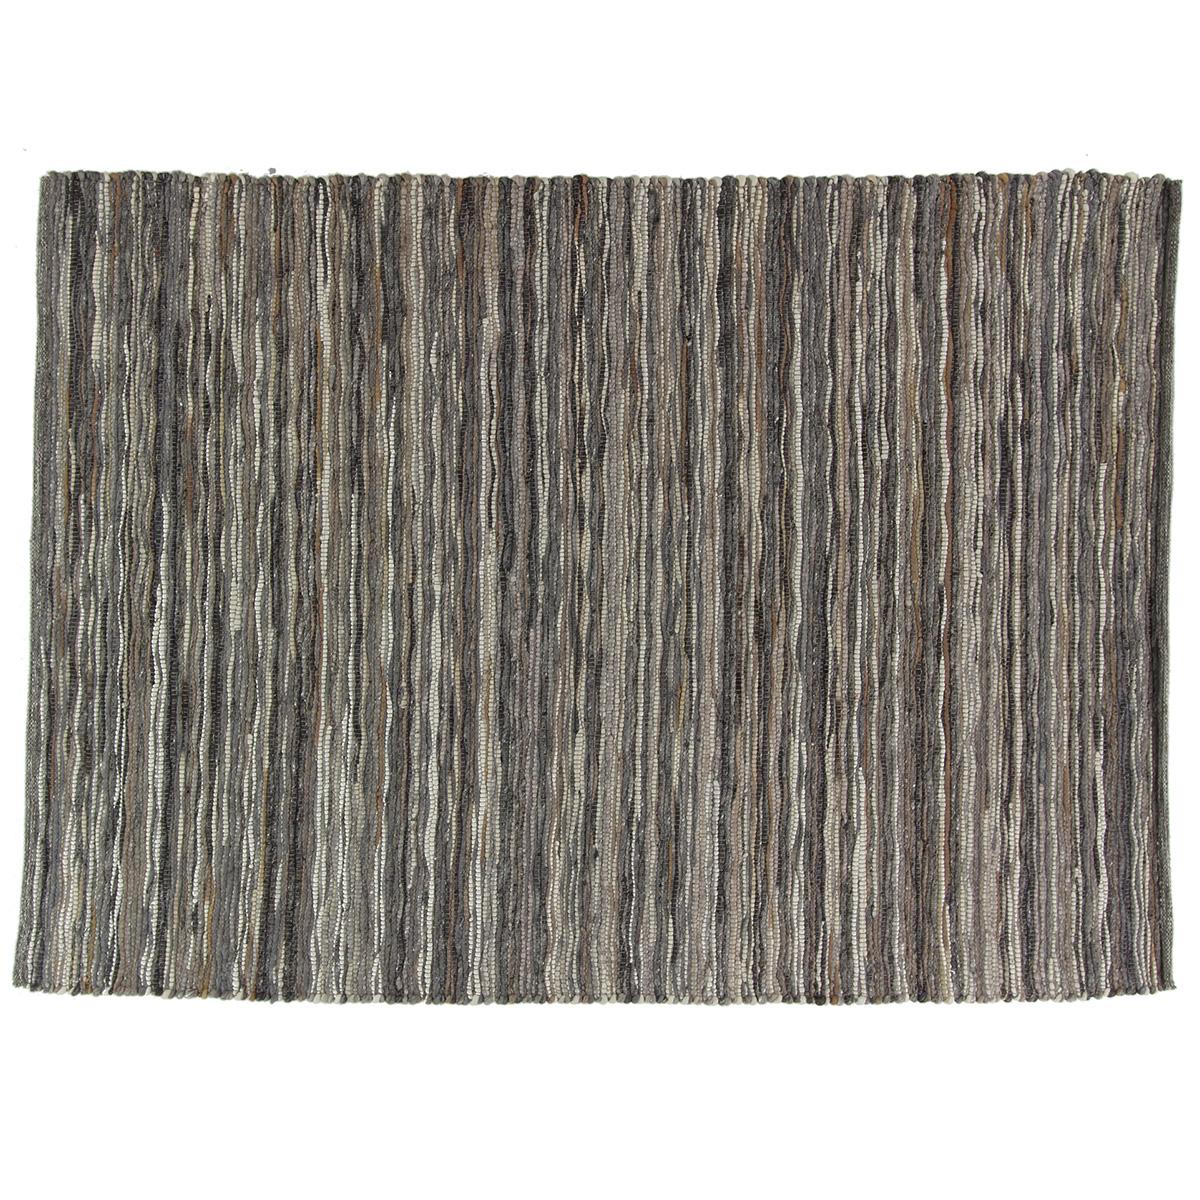 Vloerkleed Brinker Felix Grey Multi | 160 x 230 cm